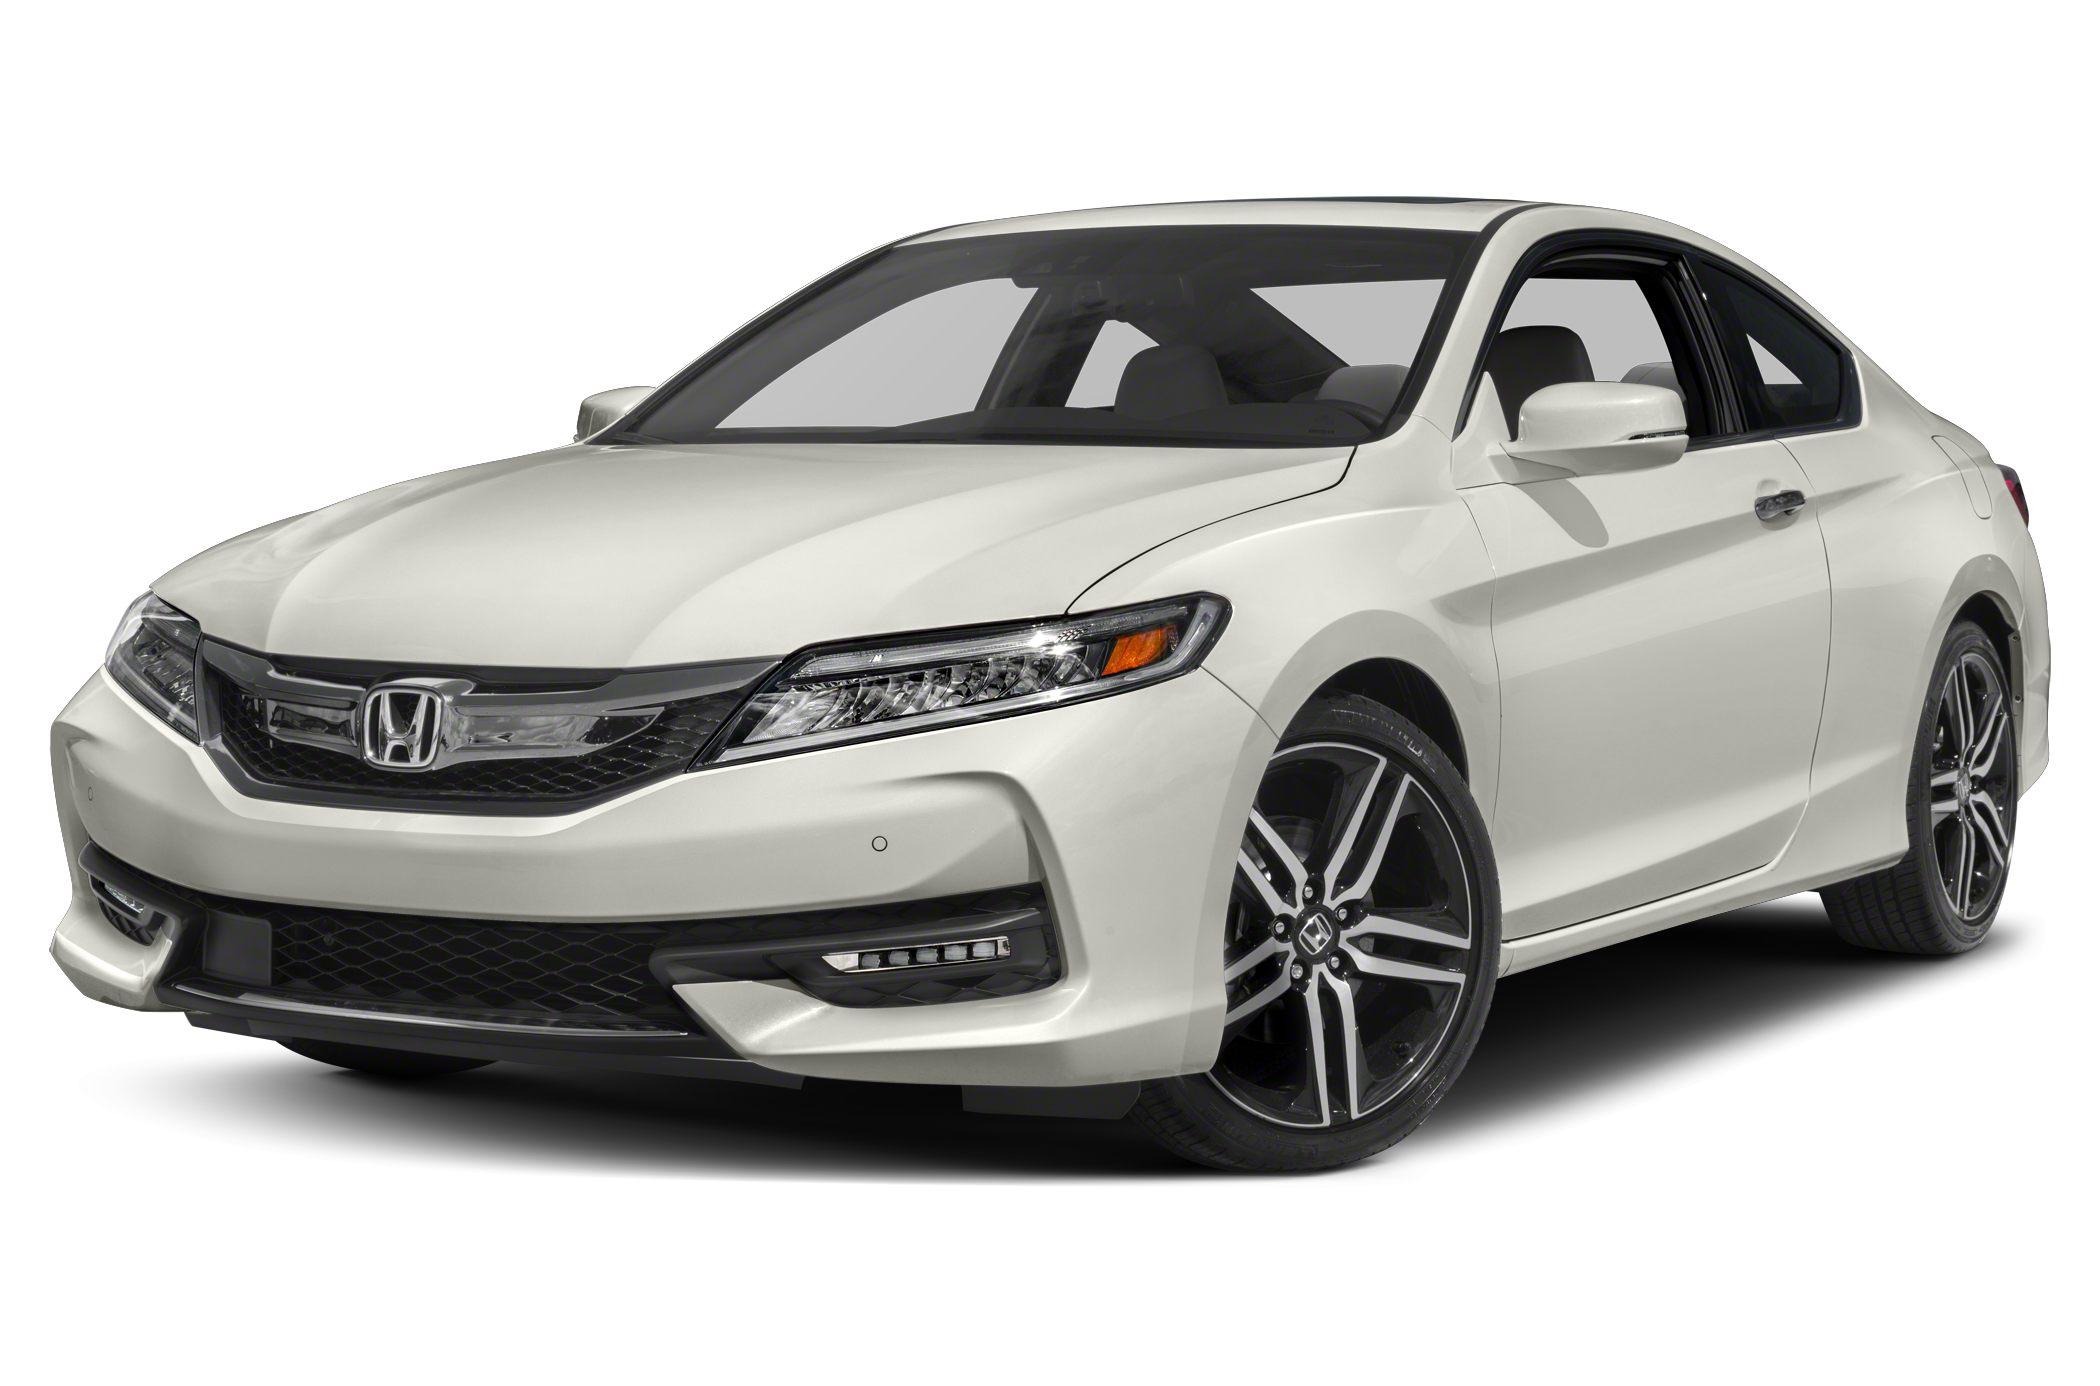 Honda Accord Sedan Models, Price, Specs, Reviews | Cars.com